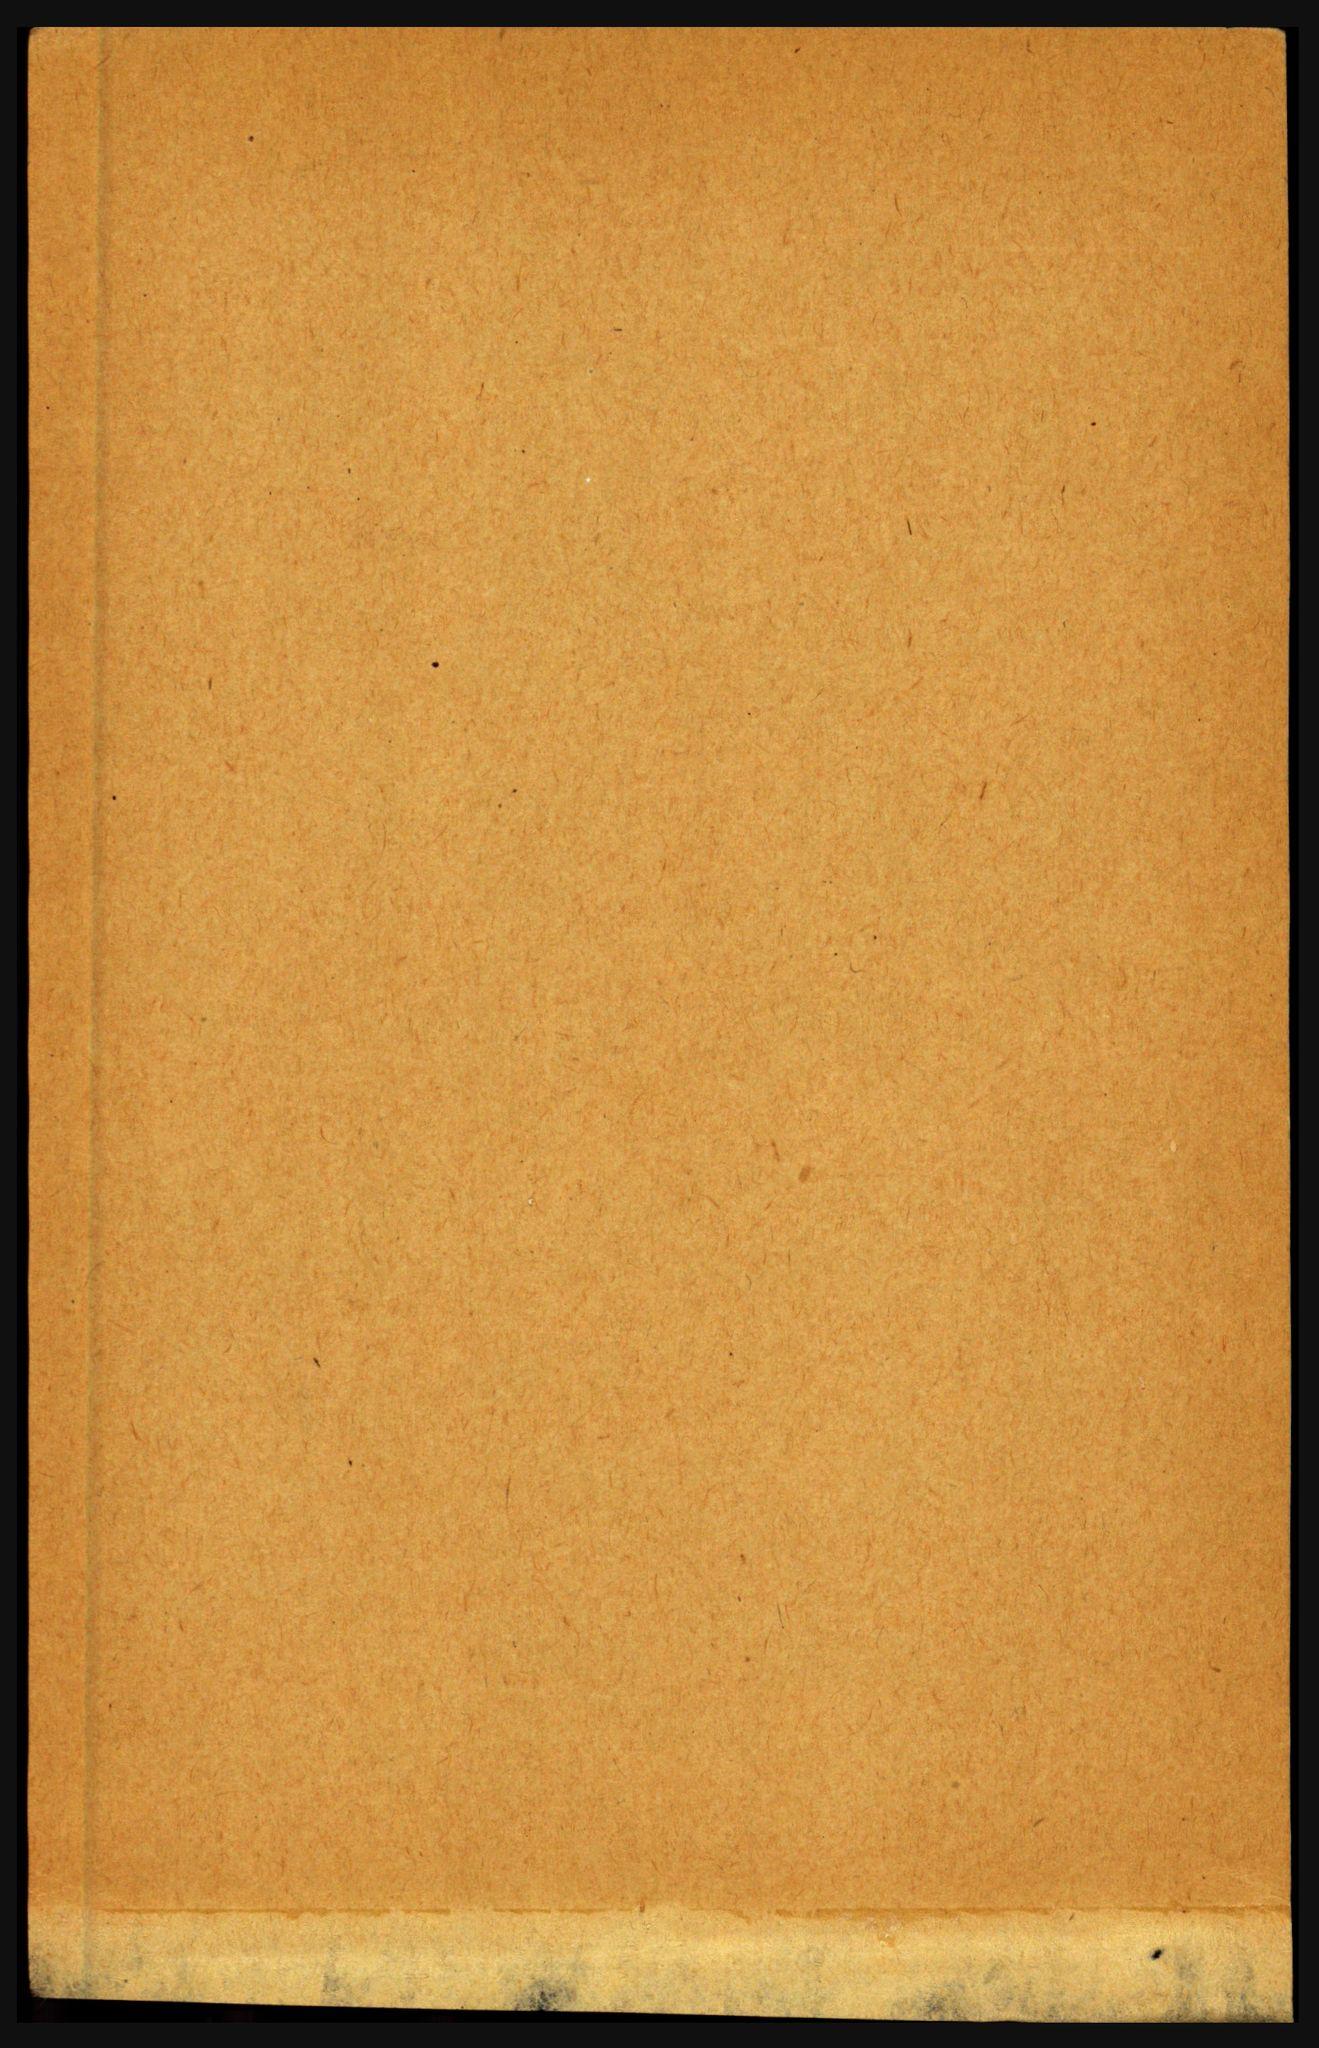 RA, Folketelling 1891 for 1859 Flakstad herred, 1891, s. 1859